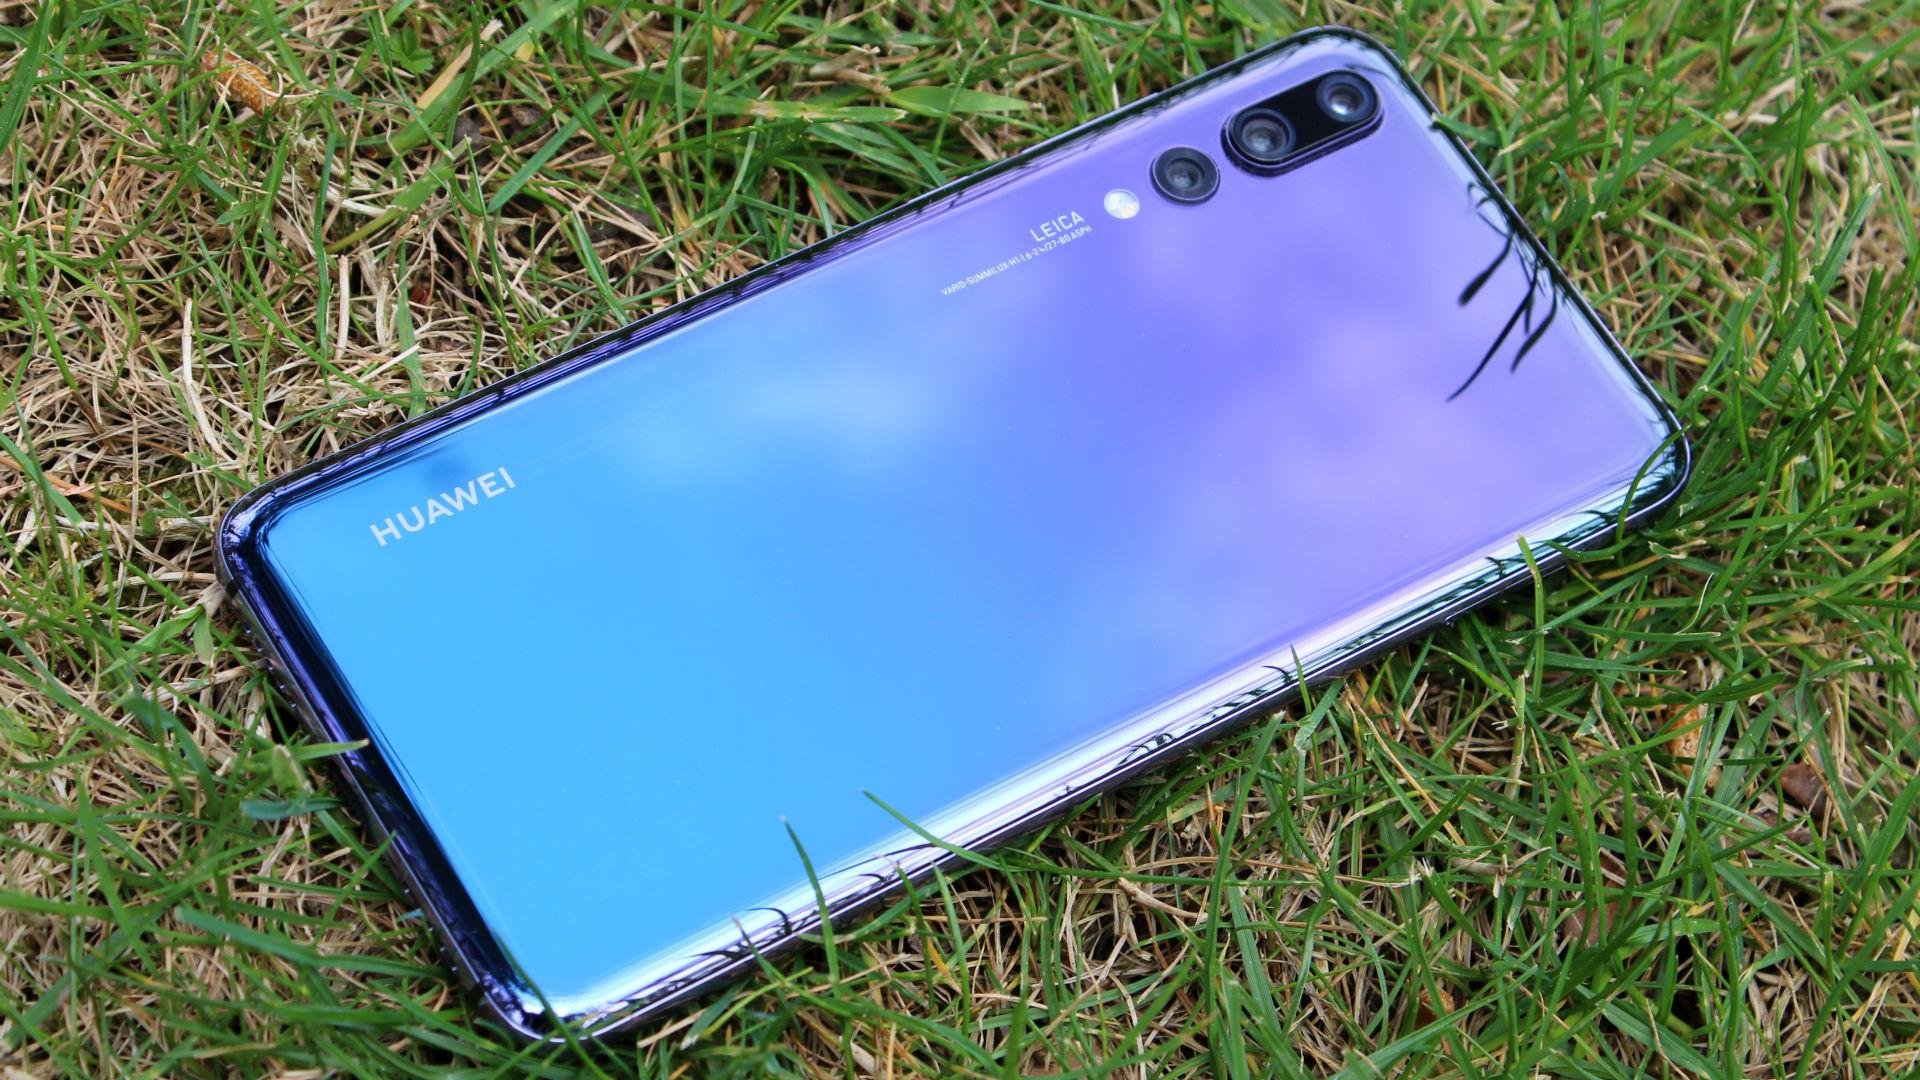 Huawei P20 и Huawei P20 Pro, наконец-то, получили обновление Android 10 с оболочкой EMUI 10 за пределами Китая